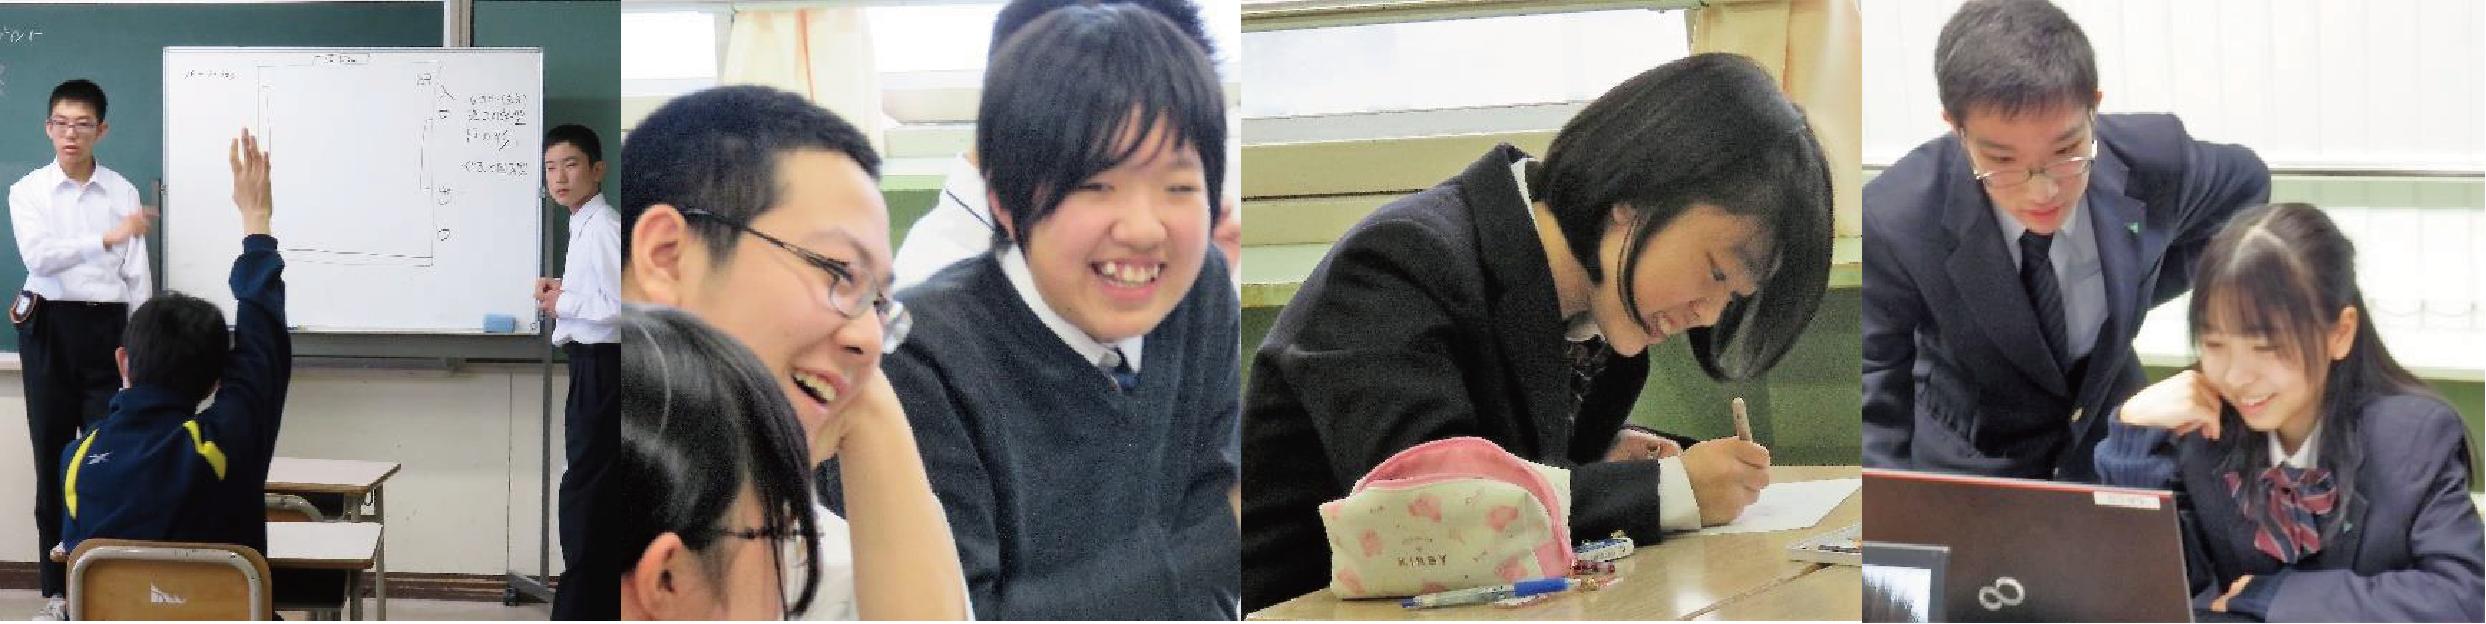 momiji_oshirase20200321.png